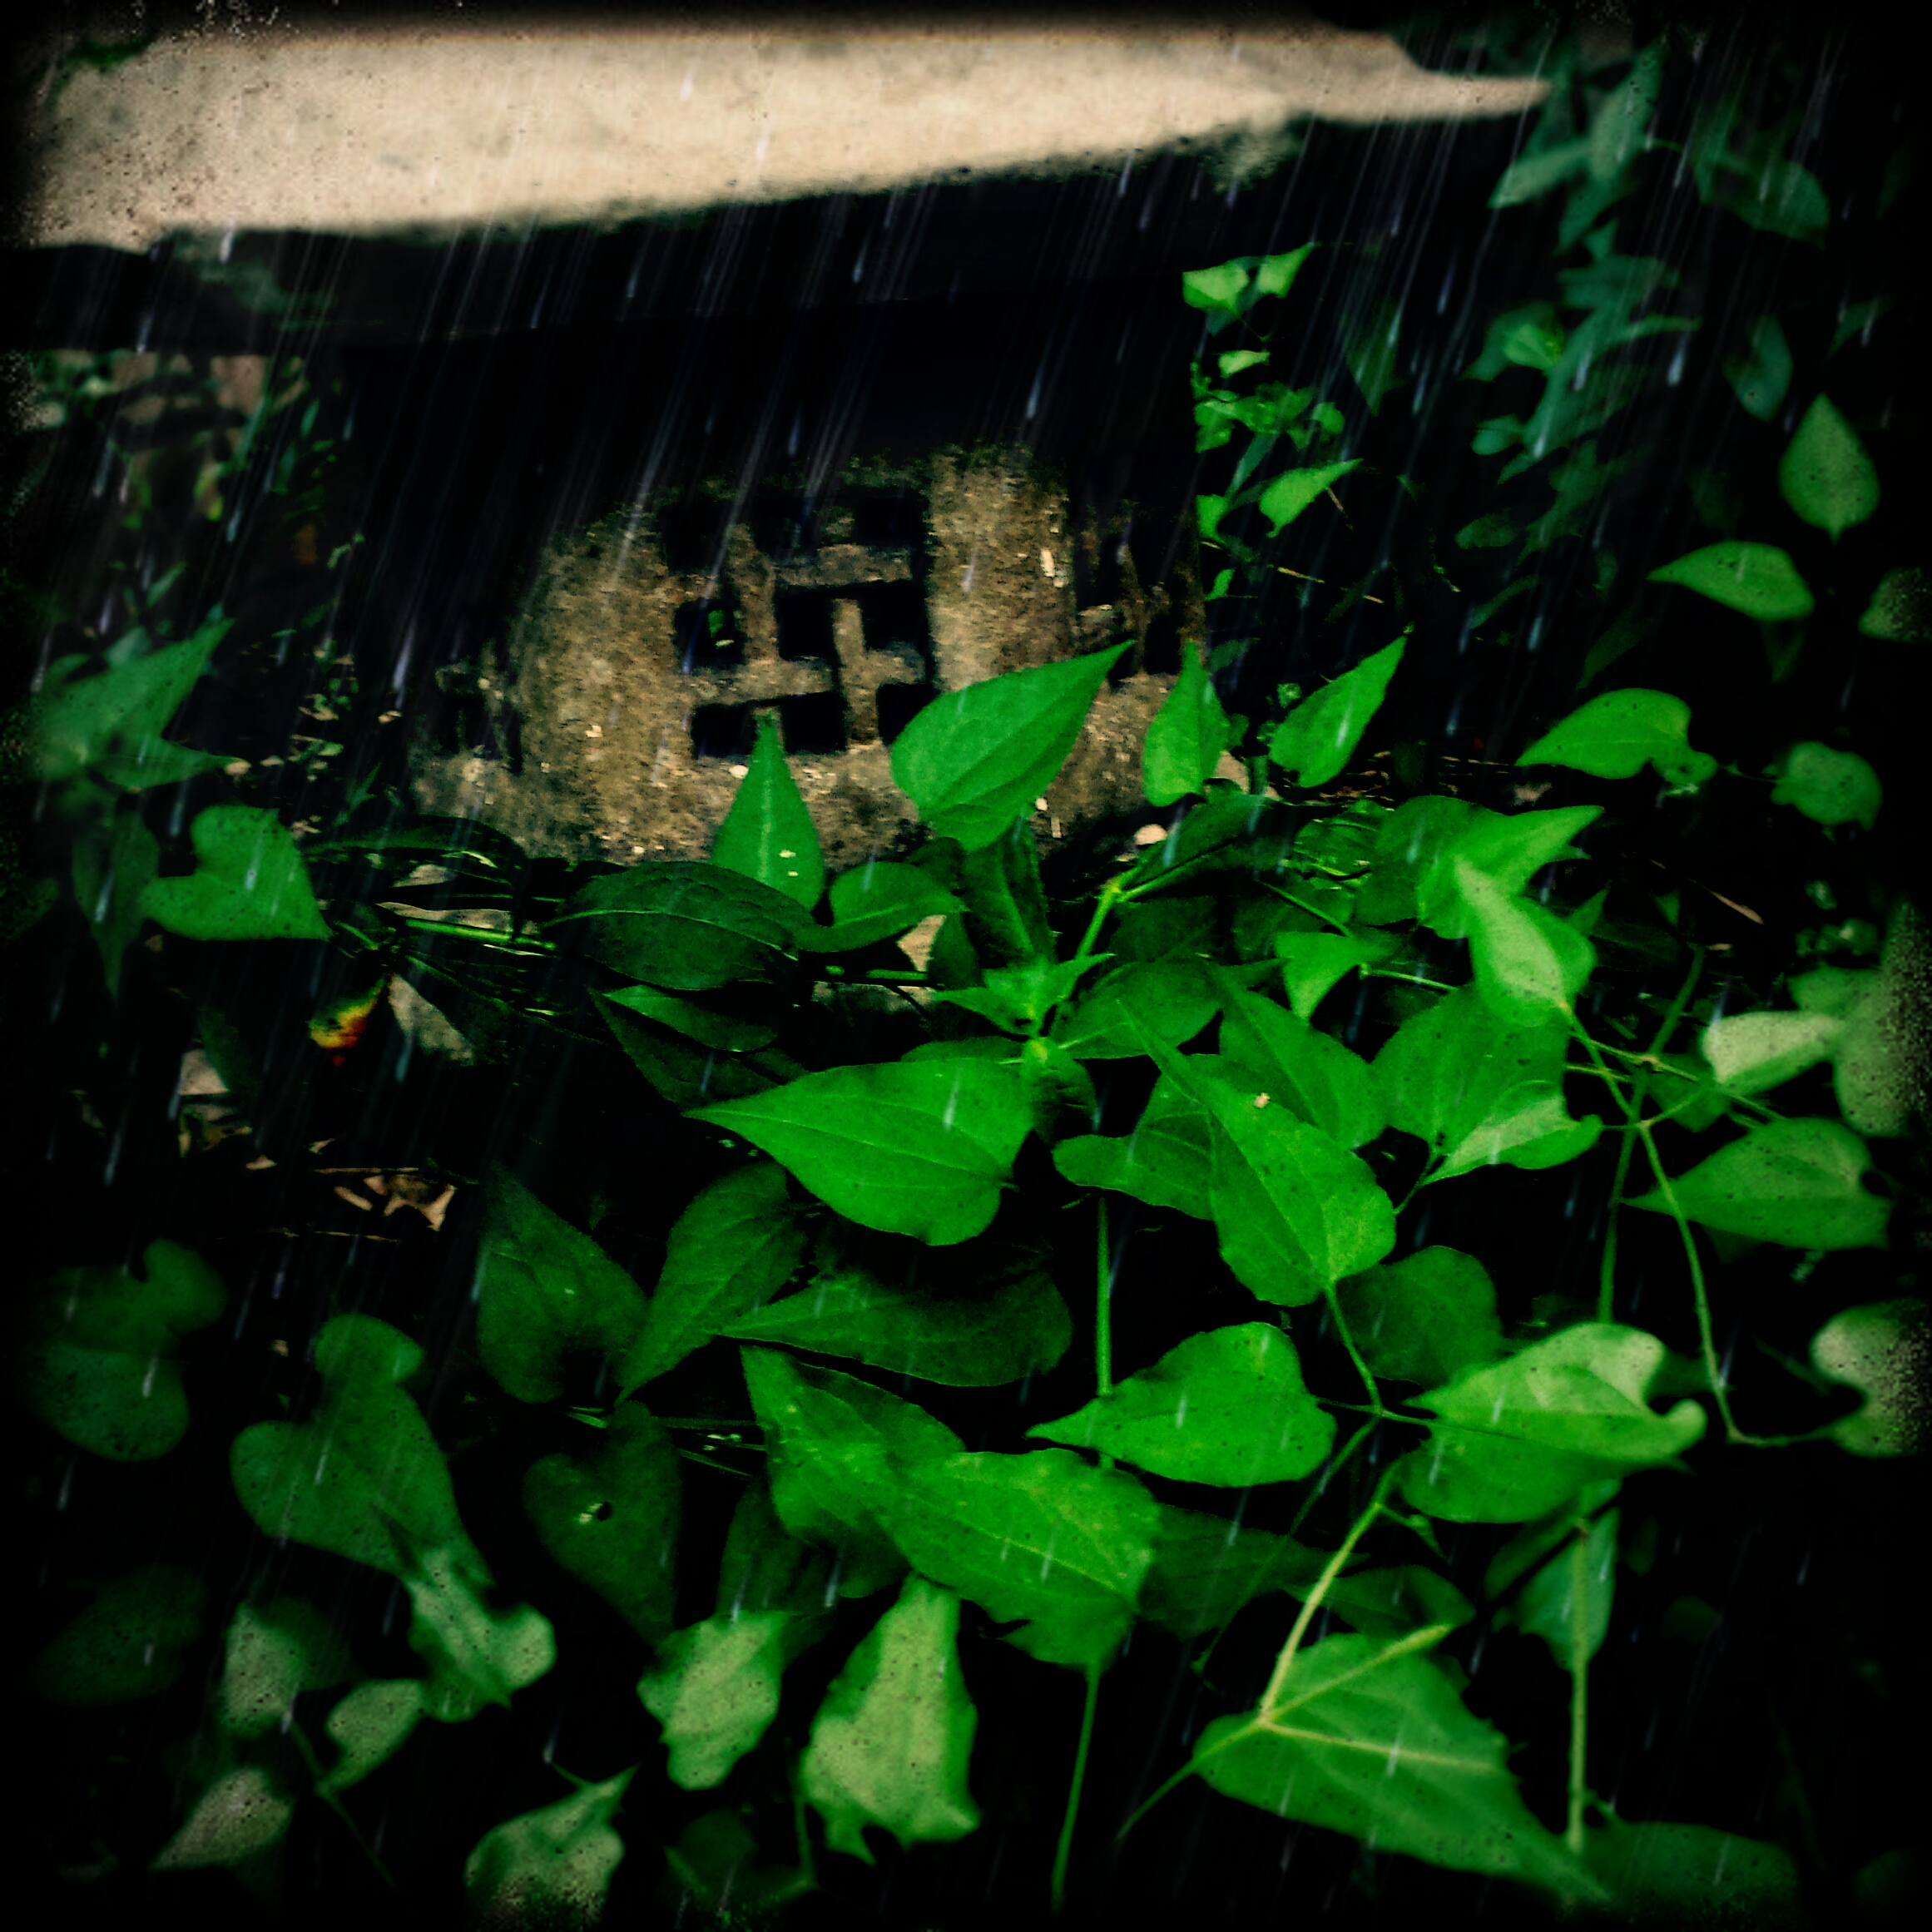 20130706_175035_Tony_Rain_Sand.jpg